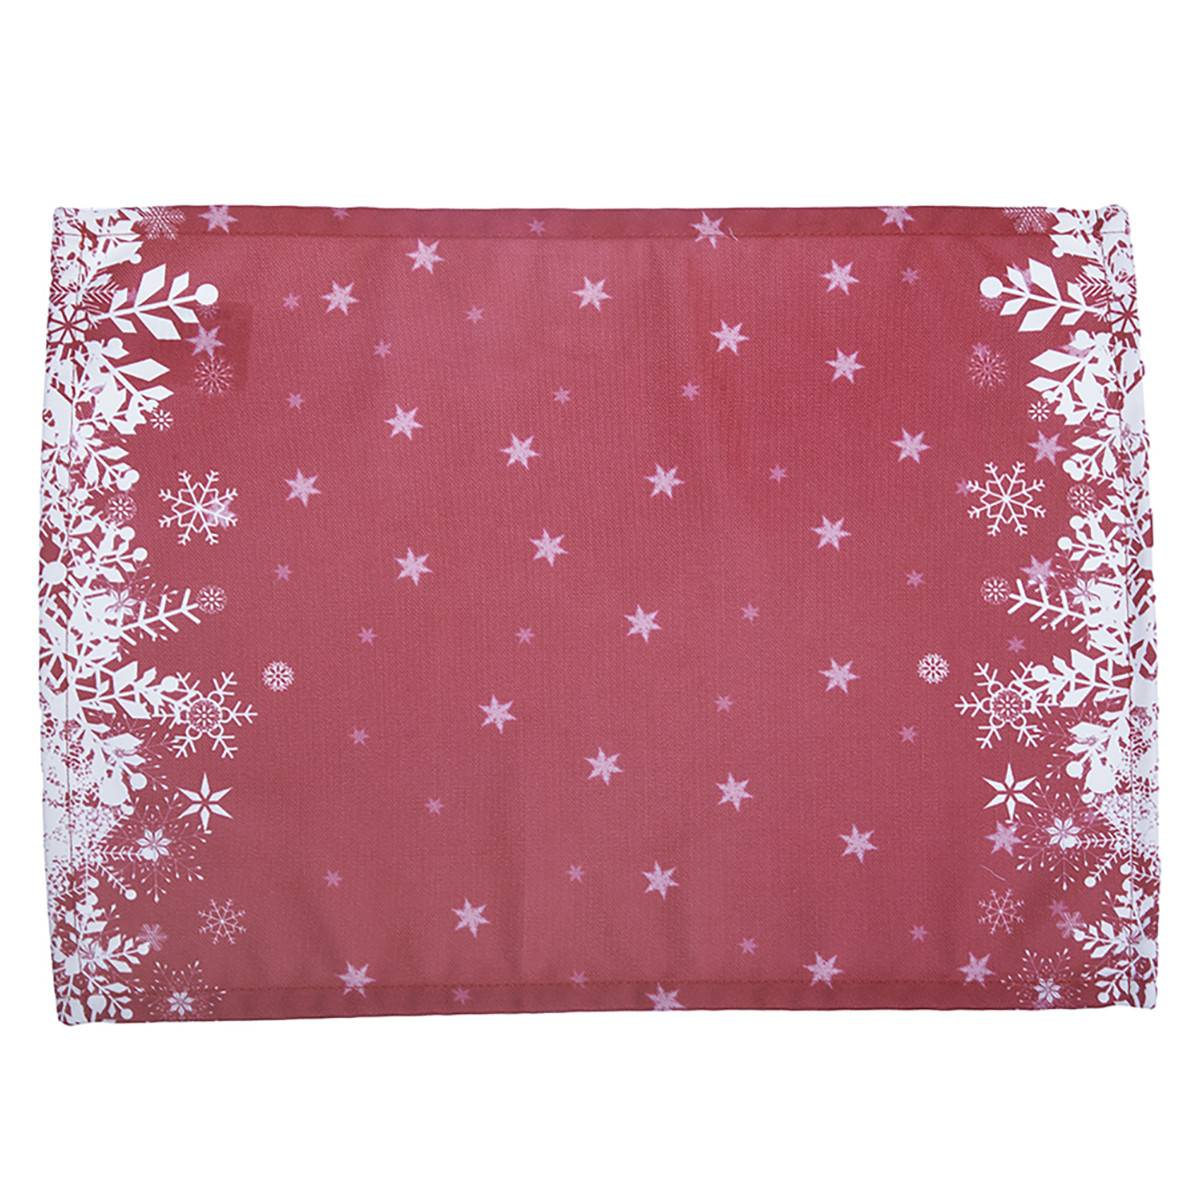 Apolena Χριστουγεννιάτικα Σουπλά (Σετ 2τμχ) Apolena Snow Red 790-5611/2